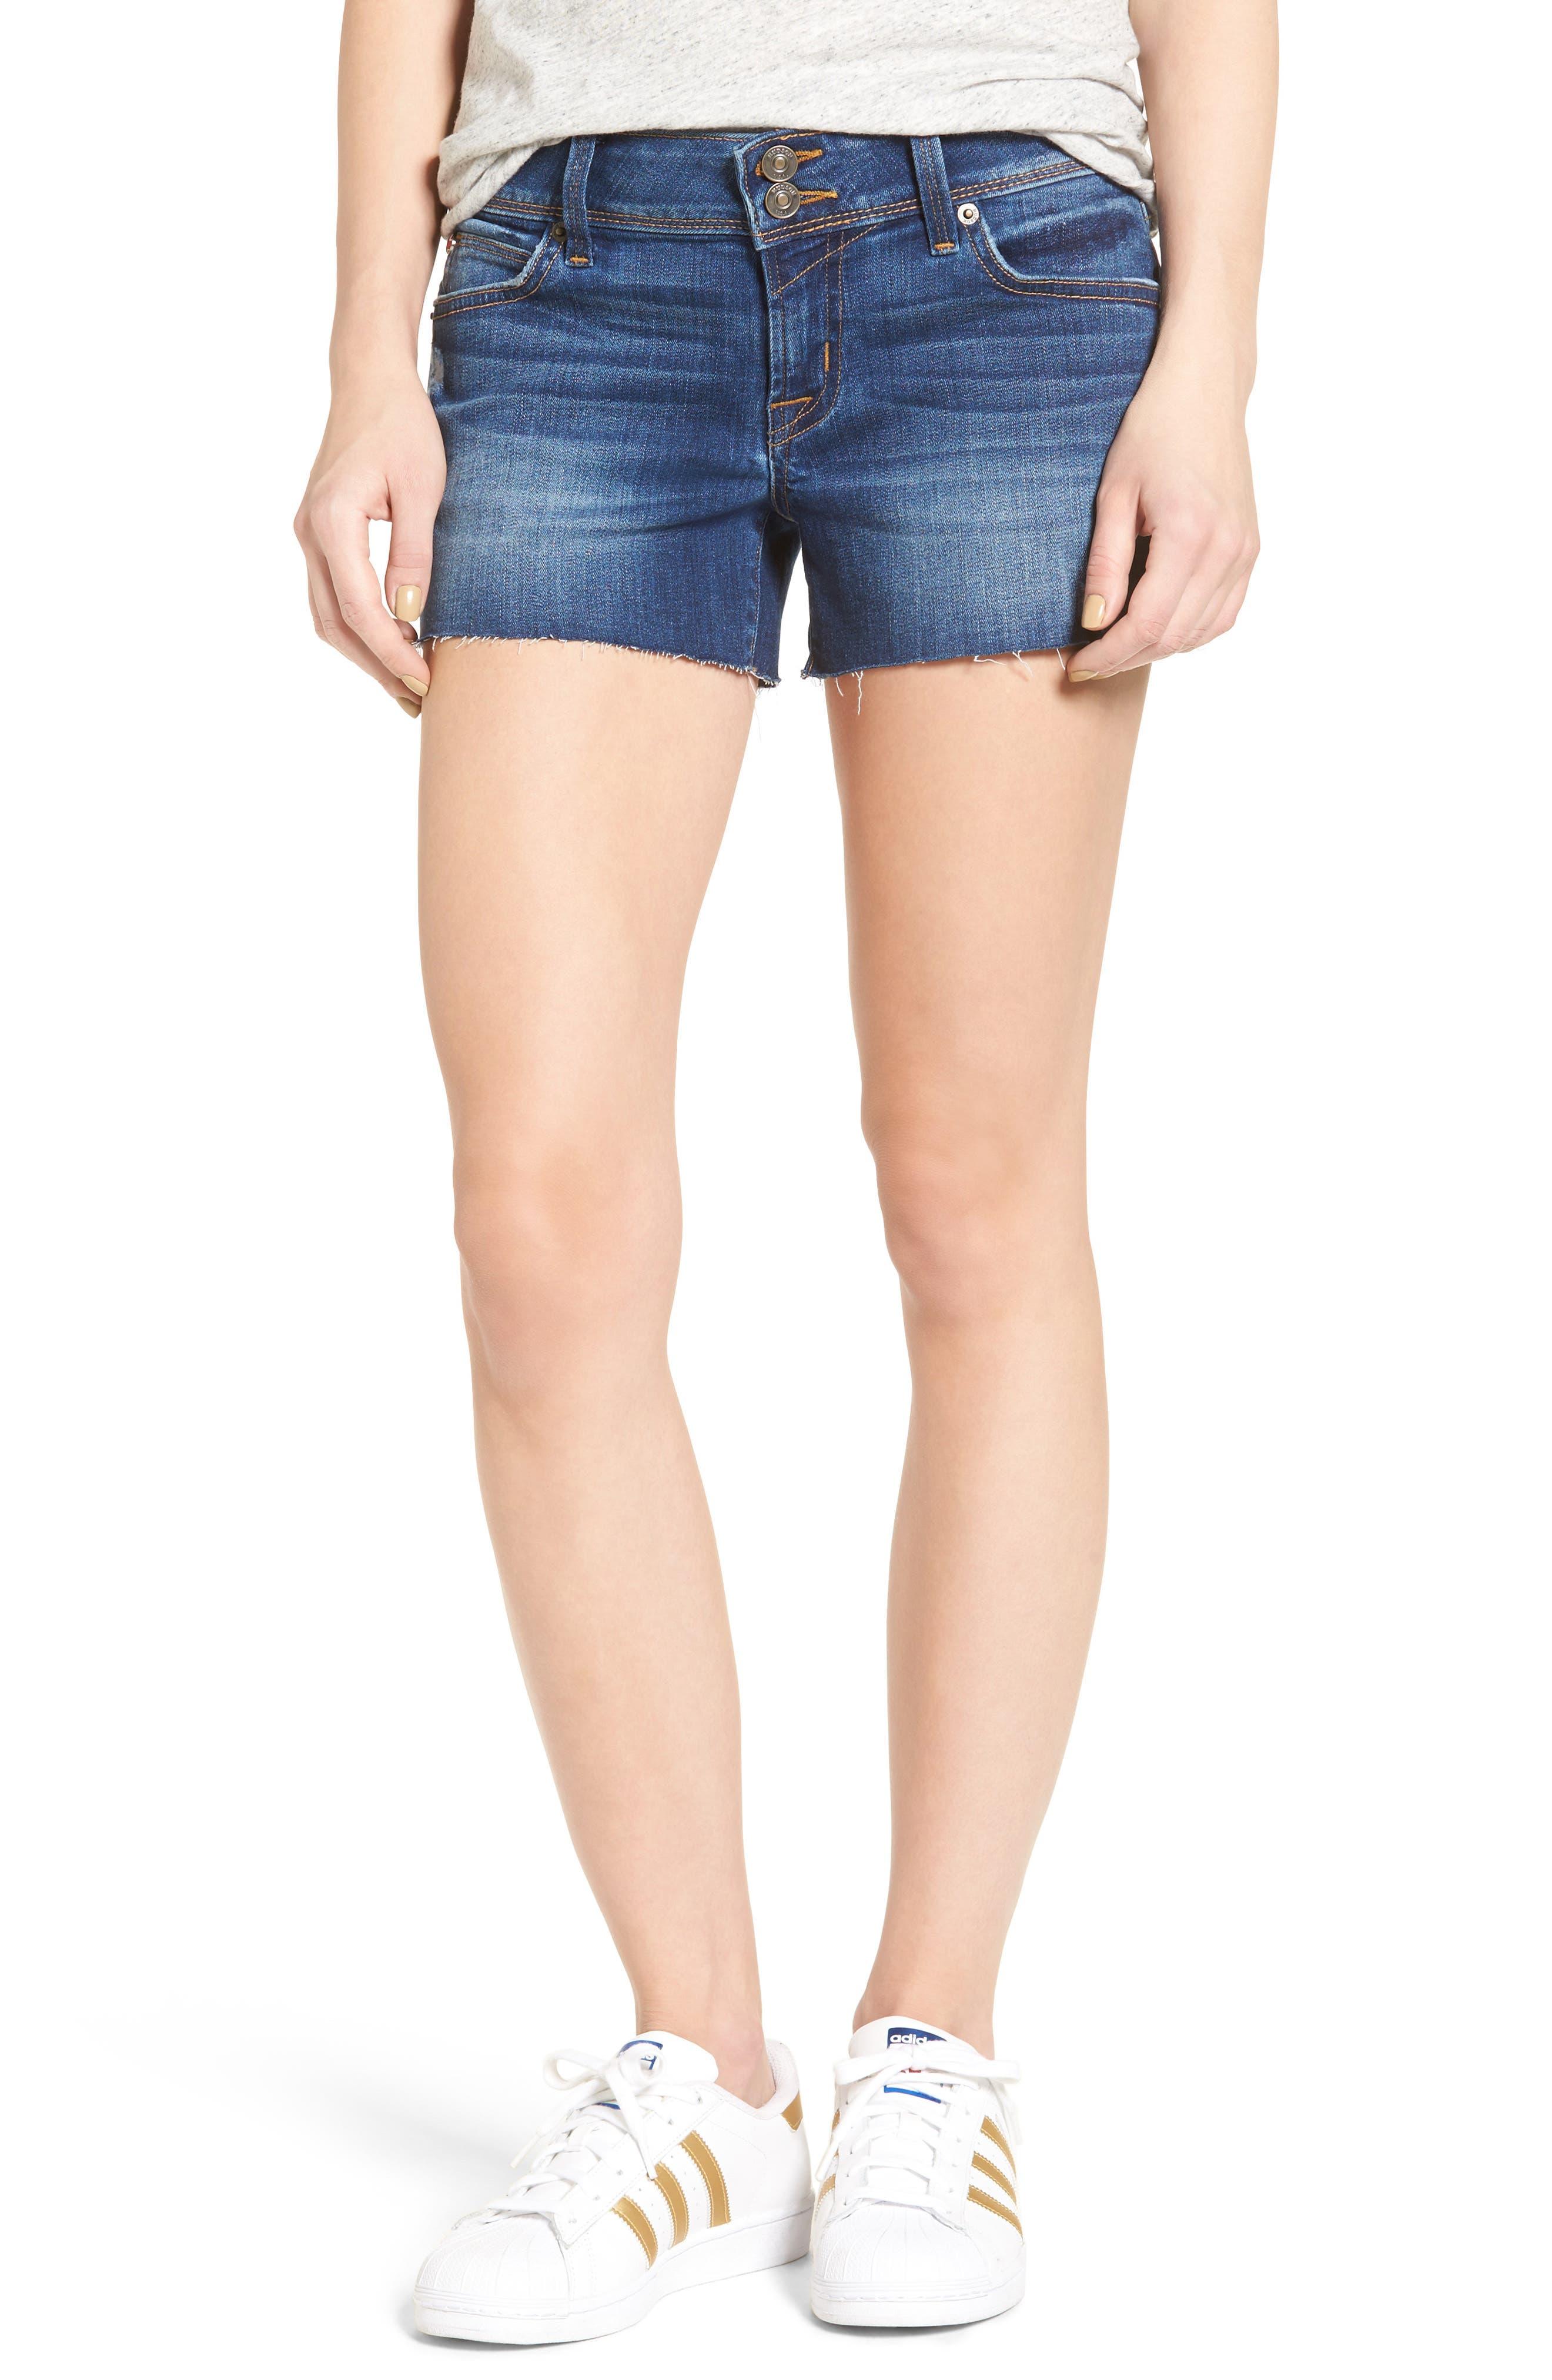 Croxley Cutoff Denim Shorts,                             Main thumbnail 1, color,                             401